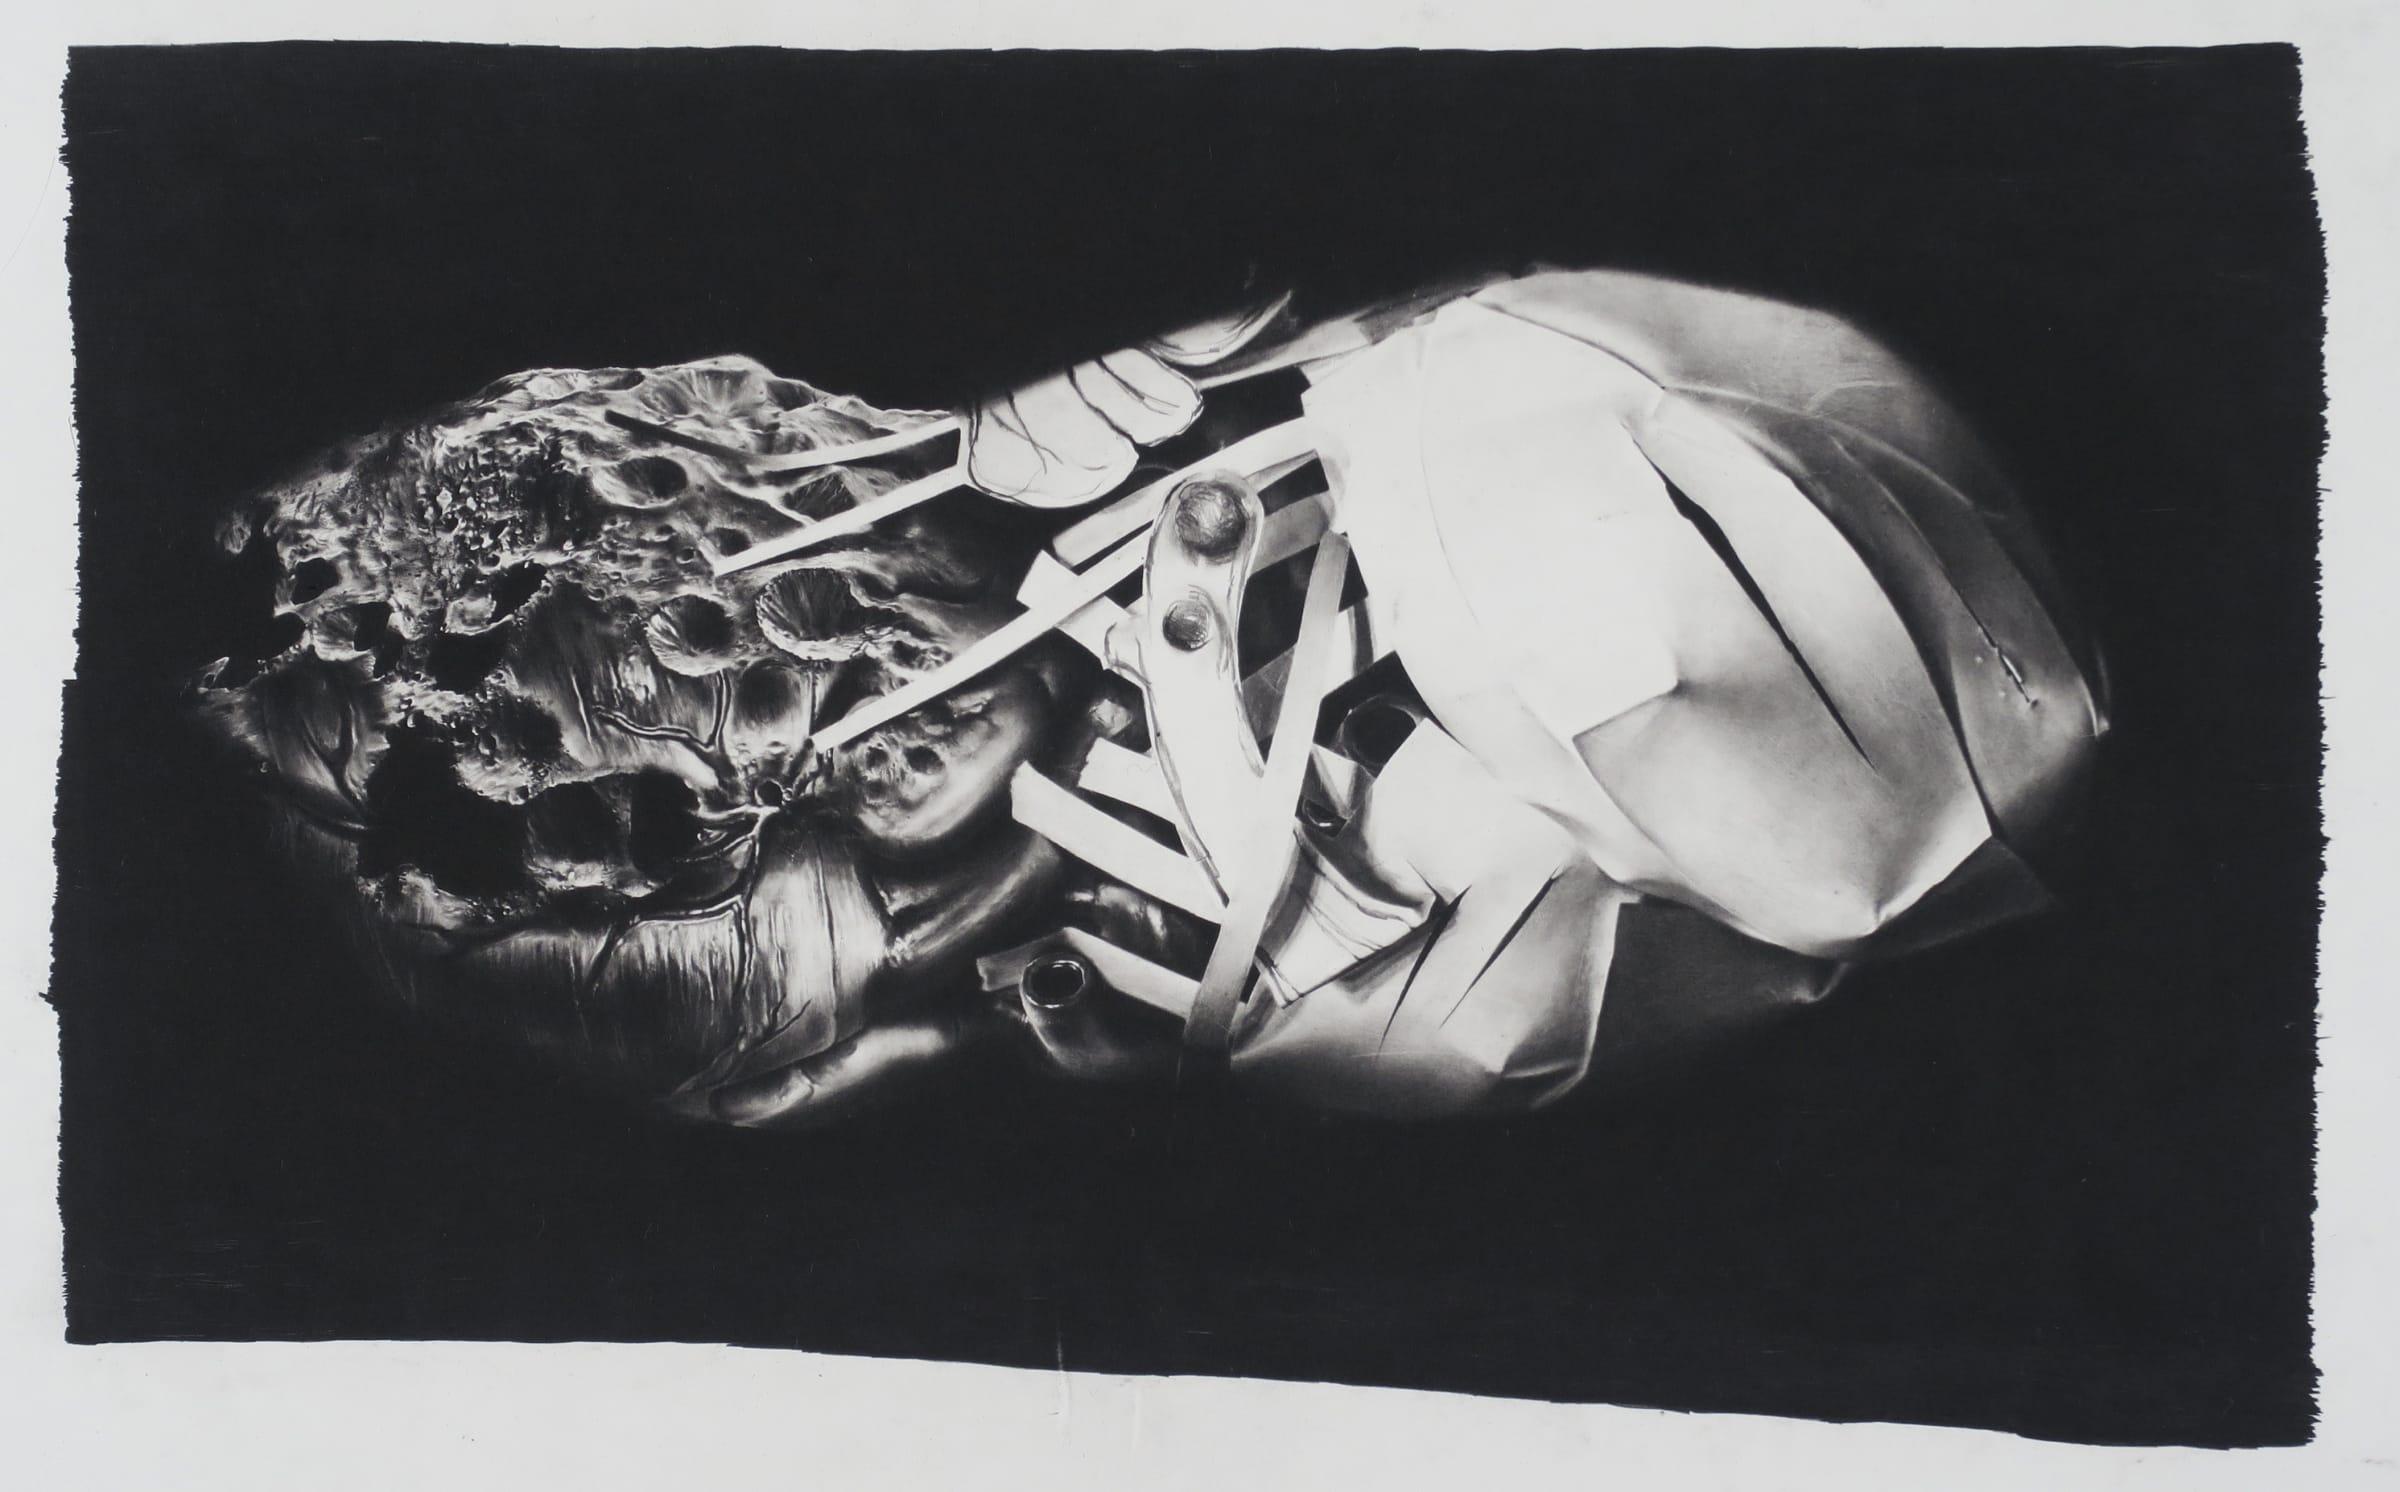 <span class=&#34;link fancybox-details-link&#34;><a href=&#34;/exhibitions/98/works/image2013/&#34;>View Detail Page</a></span><div id=&#34;artwork-panel-details&#34; class=&#34;standard-artwork-details&#34;><div class=&#34;artist&#34;><strong>Robert McNally</strong></div><div class=&#34;title&#34;><em>Dipole</em>, 2017</div><div class=&#34;medium&#34;>Photogravure on Hahnem&#252;hle paper</div><div class=&#34;dimensions&#34;>39.5 x 58 cm<br /> 15 1/2 x 22 7/8 in<br /> Framed</div><div class=&#34;dimensions&#34;><em>Courtesy of David Risley gallery Copenhagen</em></div></div>